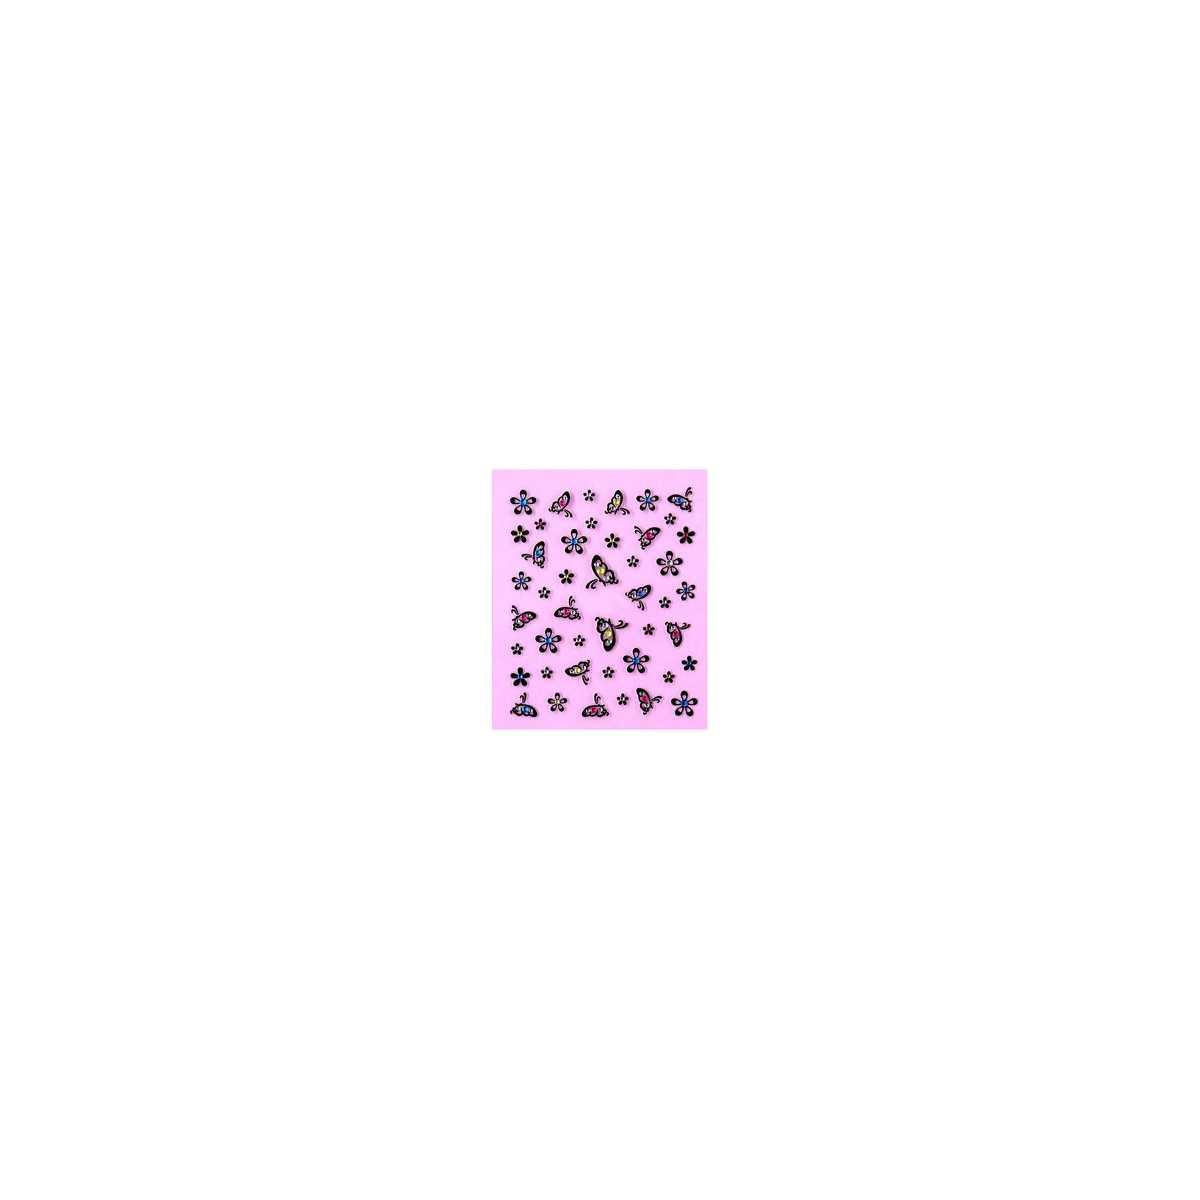 https://www.kit-manucure.com/641-thickbox_default/stickers-nail-art-papillon-et-fleur-avec-strass.jpg